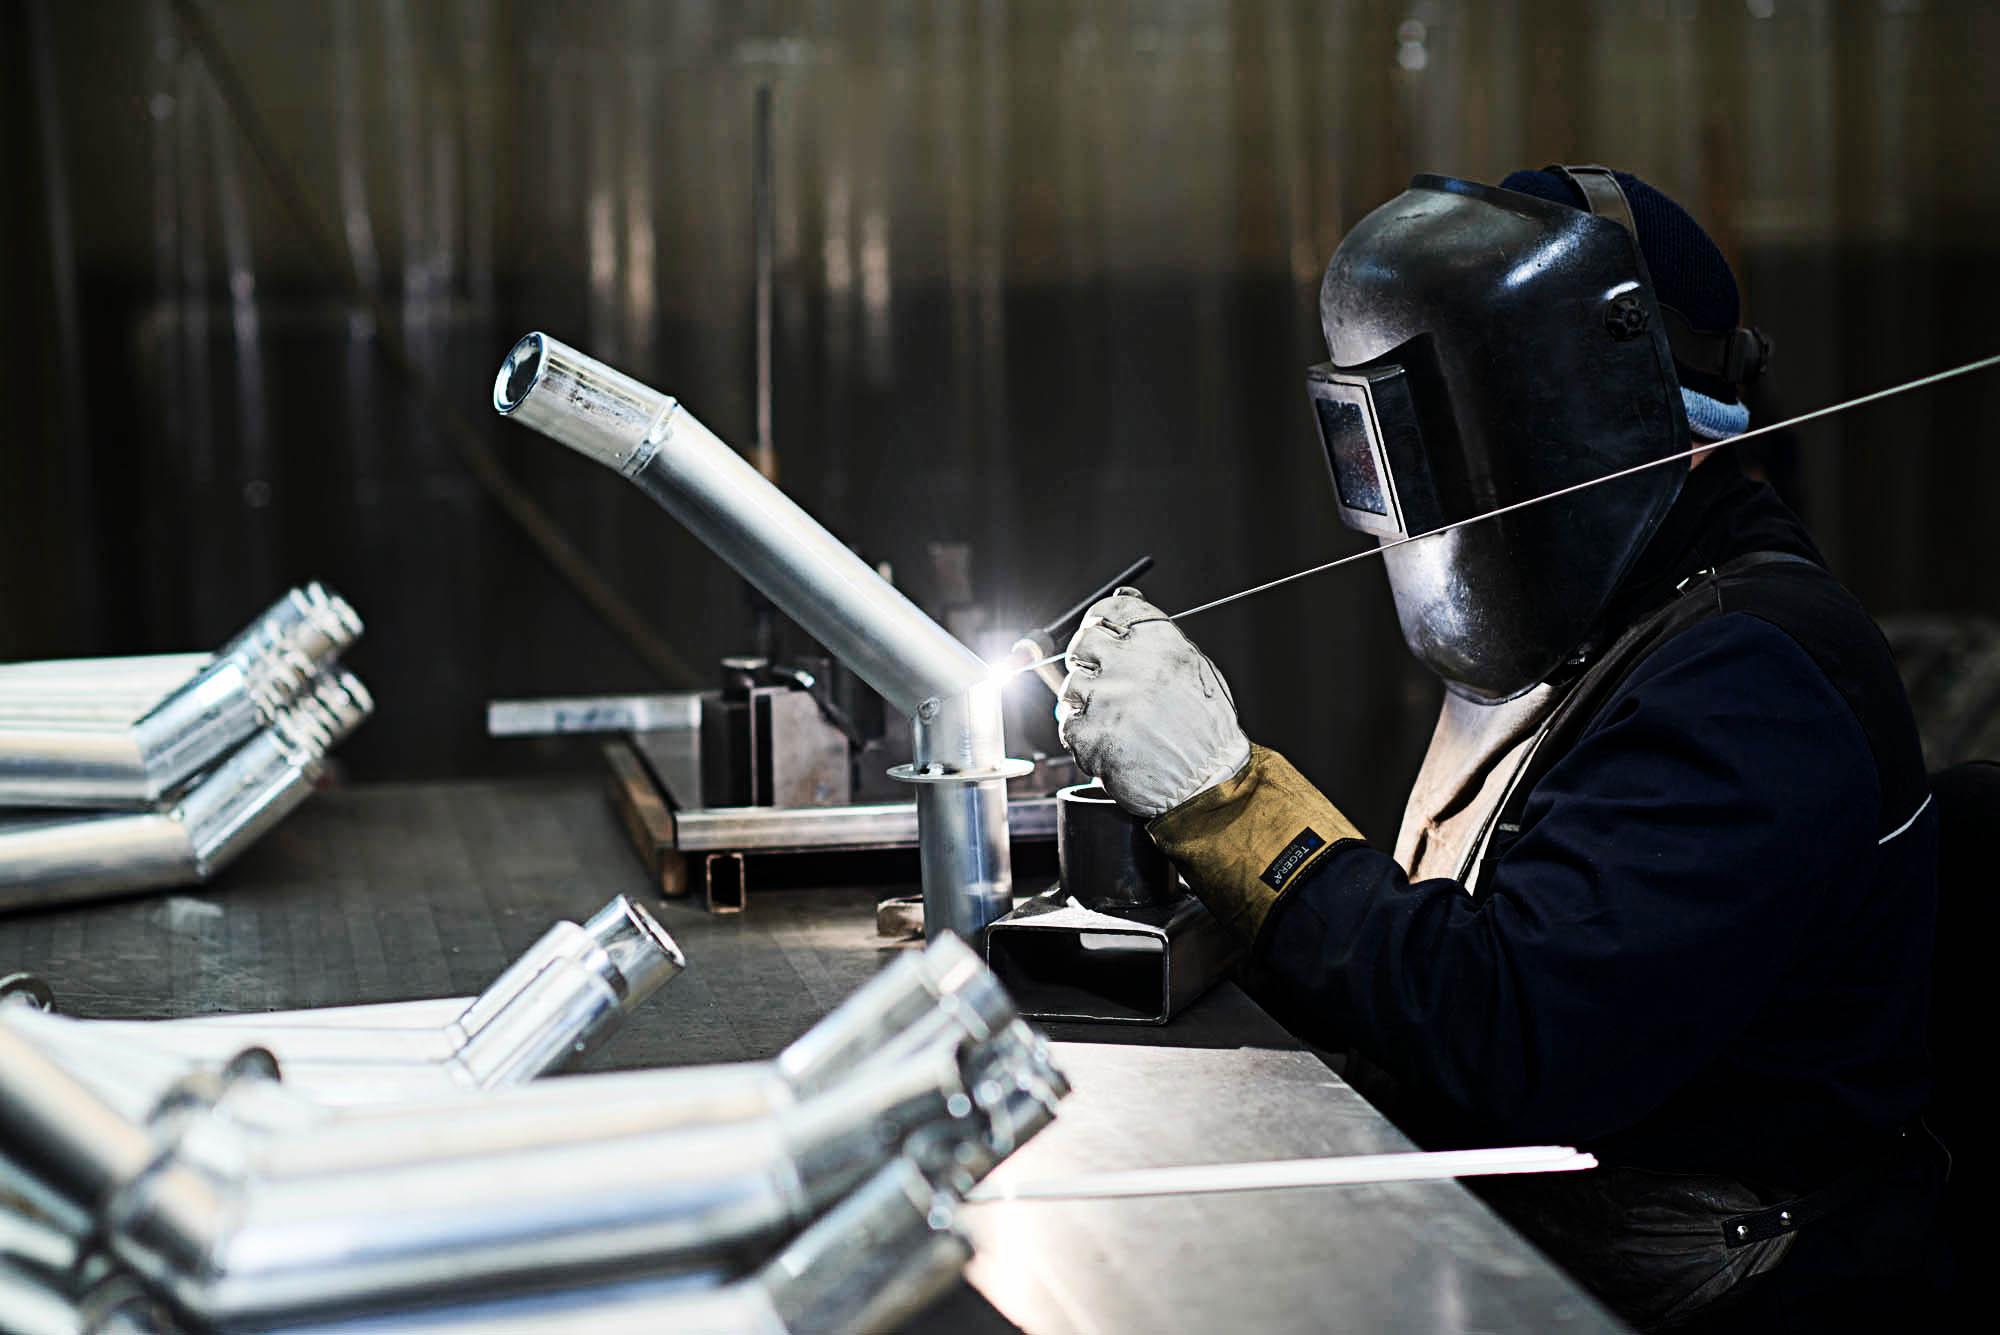 OPC 161220 14983 1 - Jud Metallbearbeitung: Moderne Industriefotografie